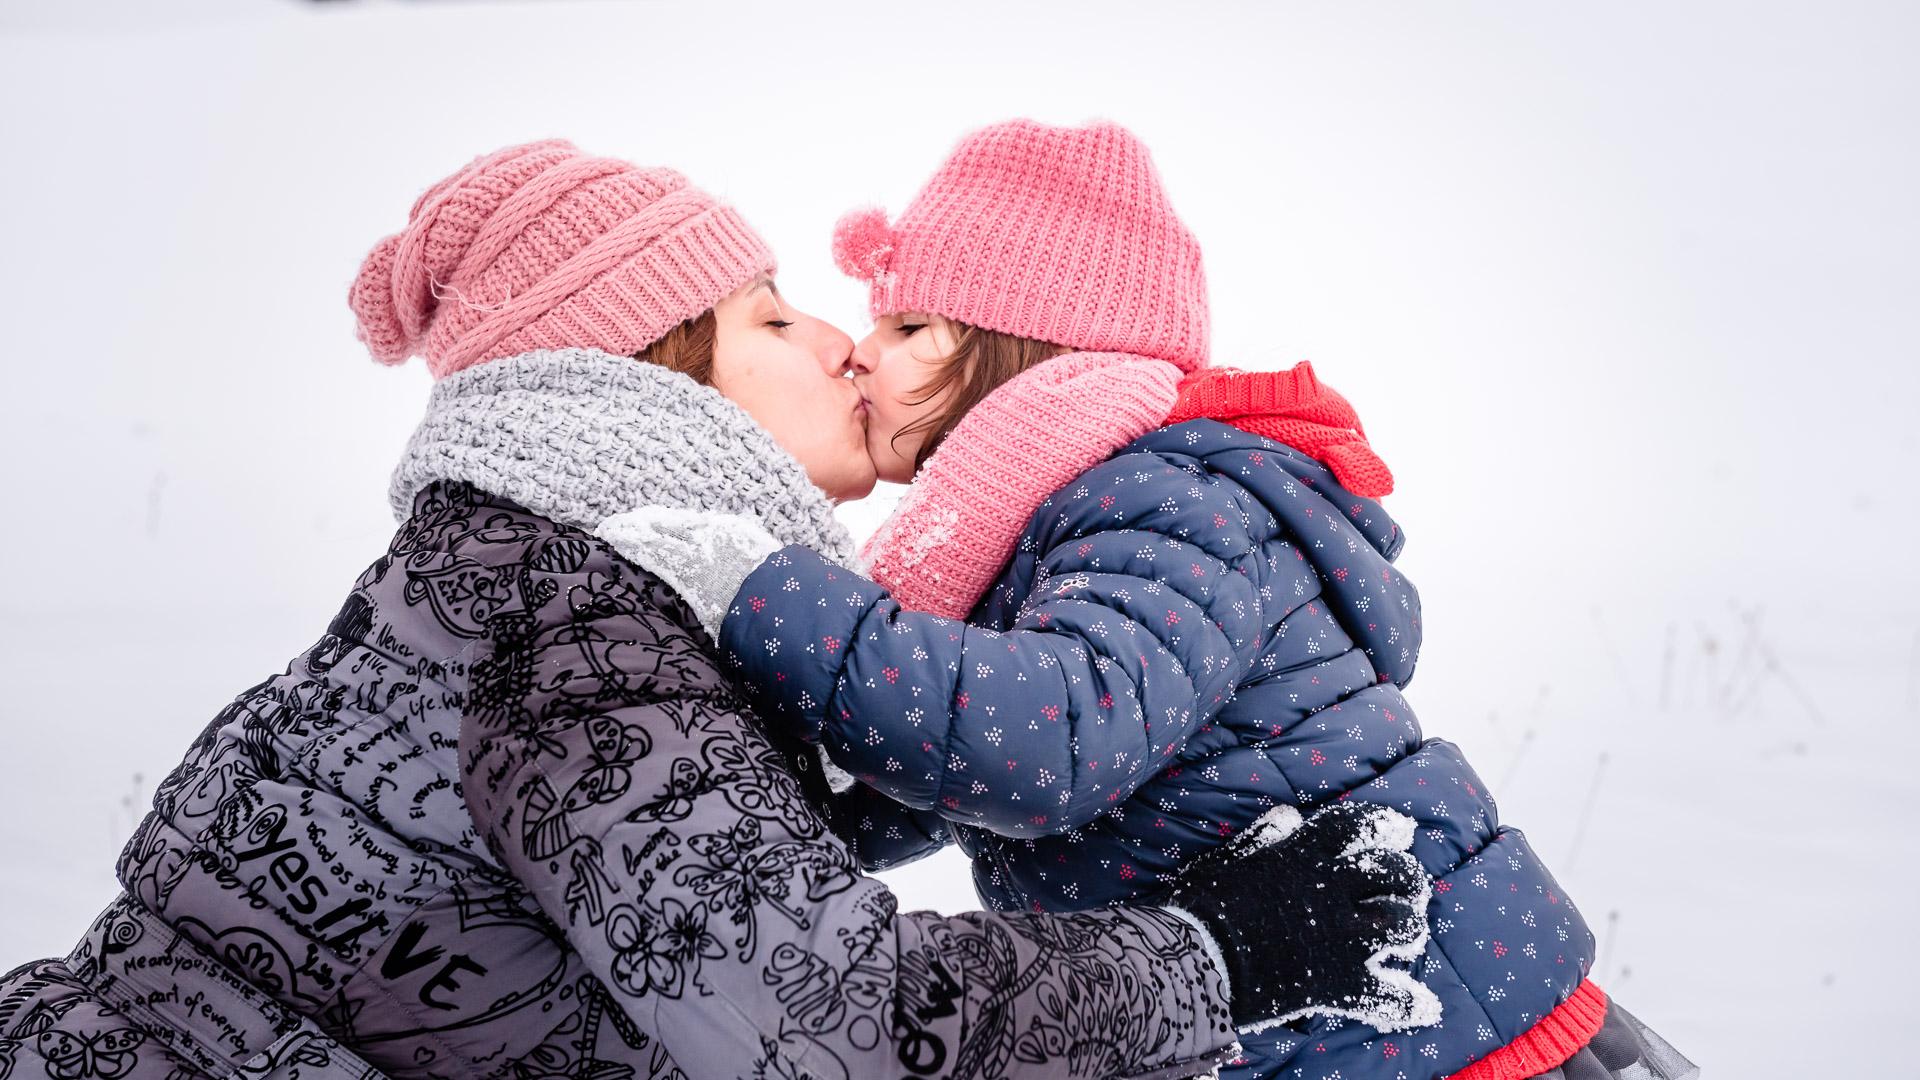 snow, mother daughter, child, pink hat, kiss, hug